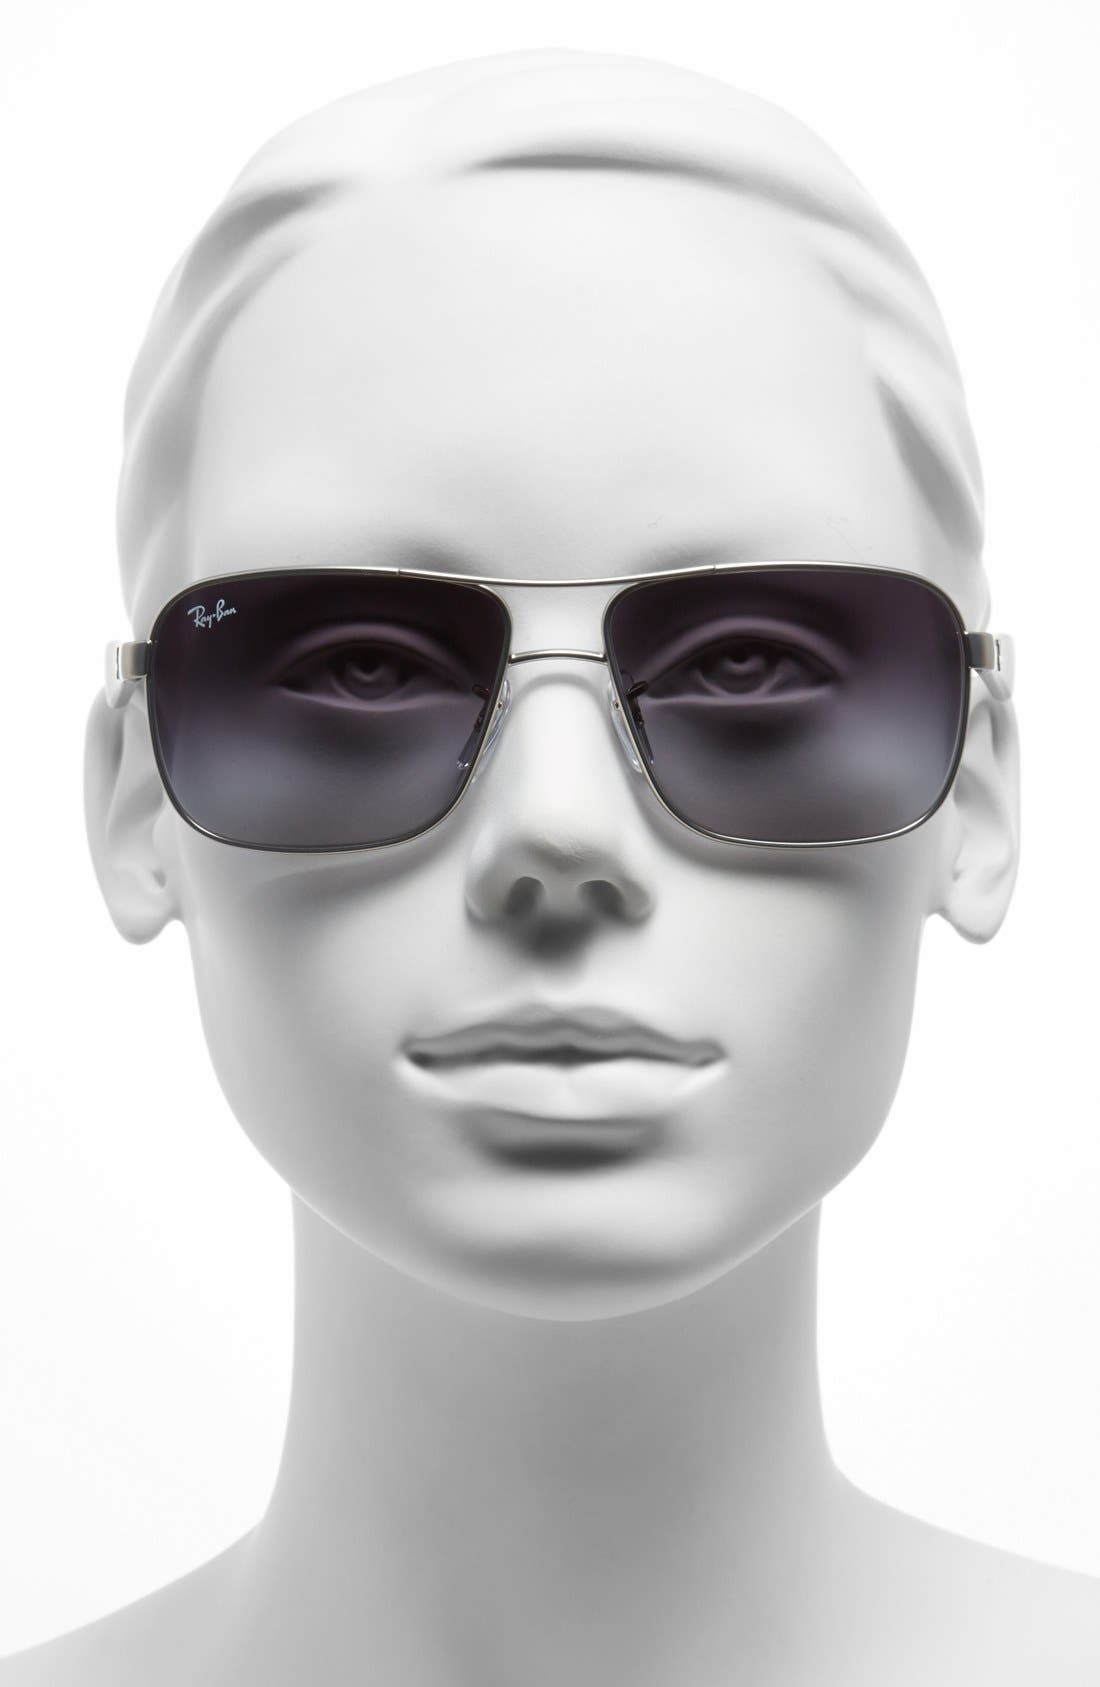 59mm Pilot Sunglasses,                             Alternate thumbnail 2, color,                             040